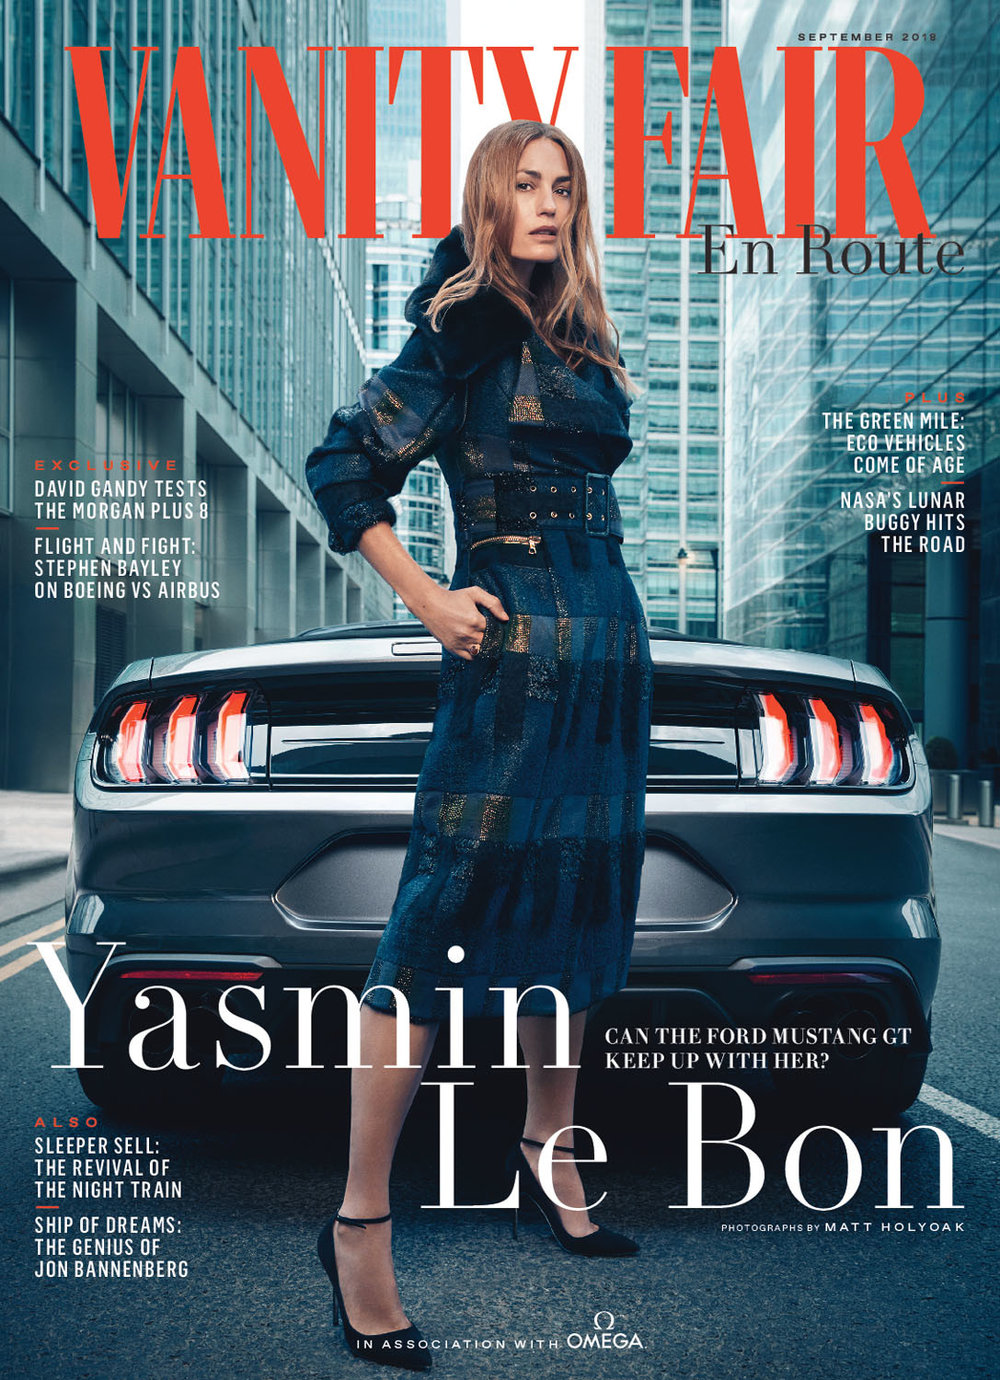 Vanity Fair UK September 2018 Yasmin Le Bon by Matt Holyoak (1).jpg